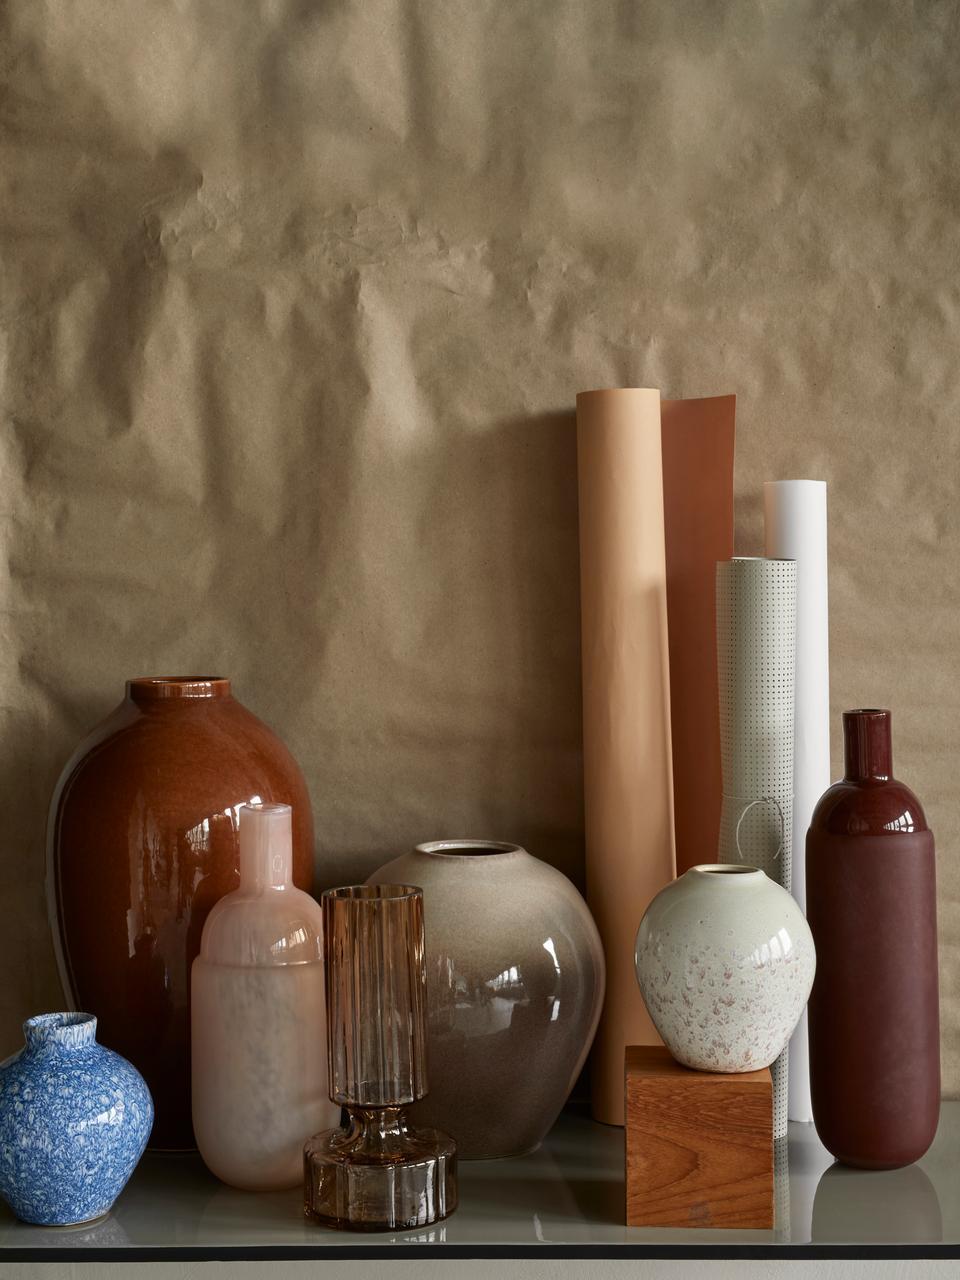 Vasen-Set Ingrid aus Keramik, 3-tlg., Keramik, Weiß, Beigetöne, Ø 14 x H 15 cm